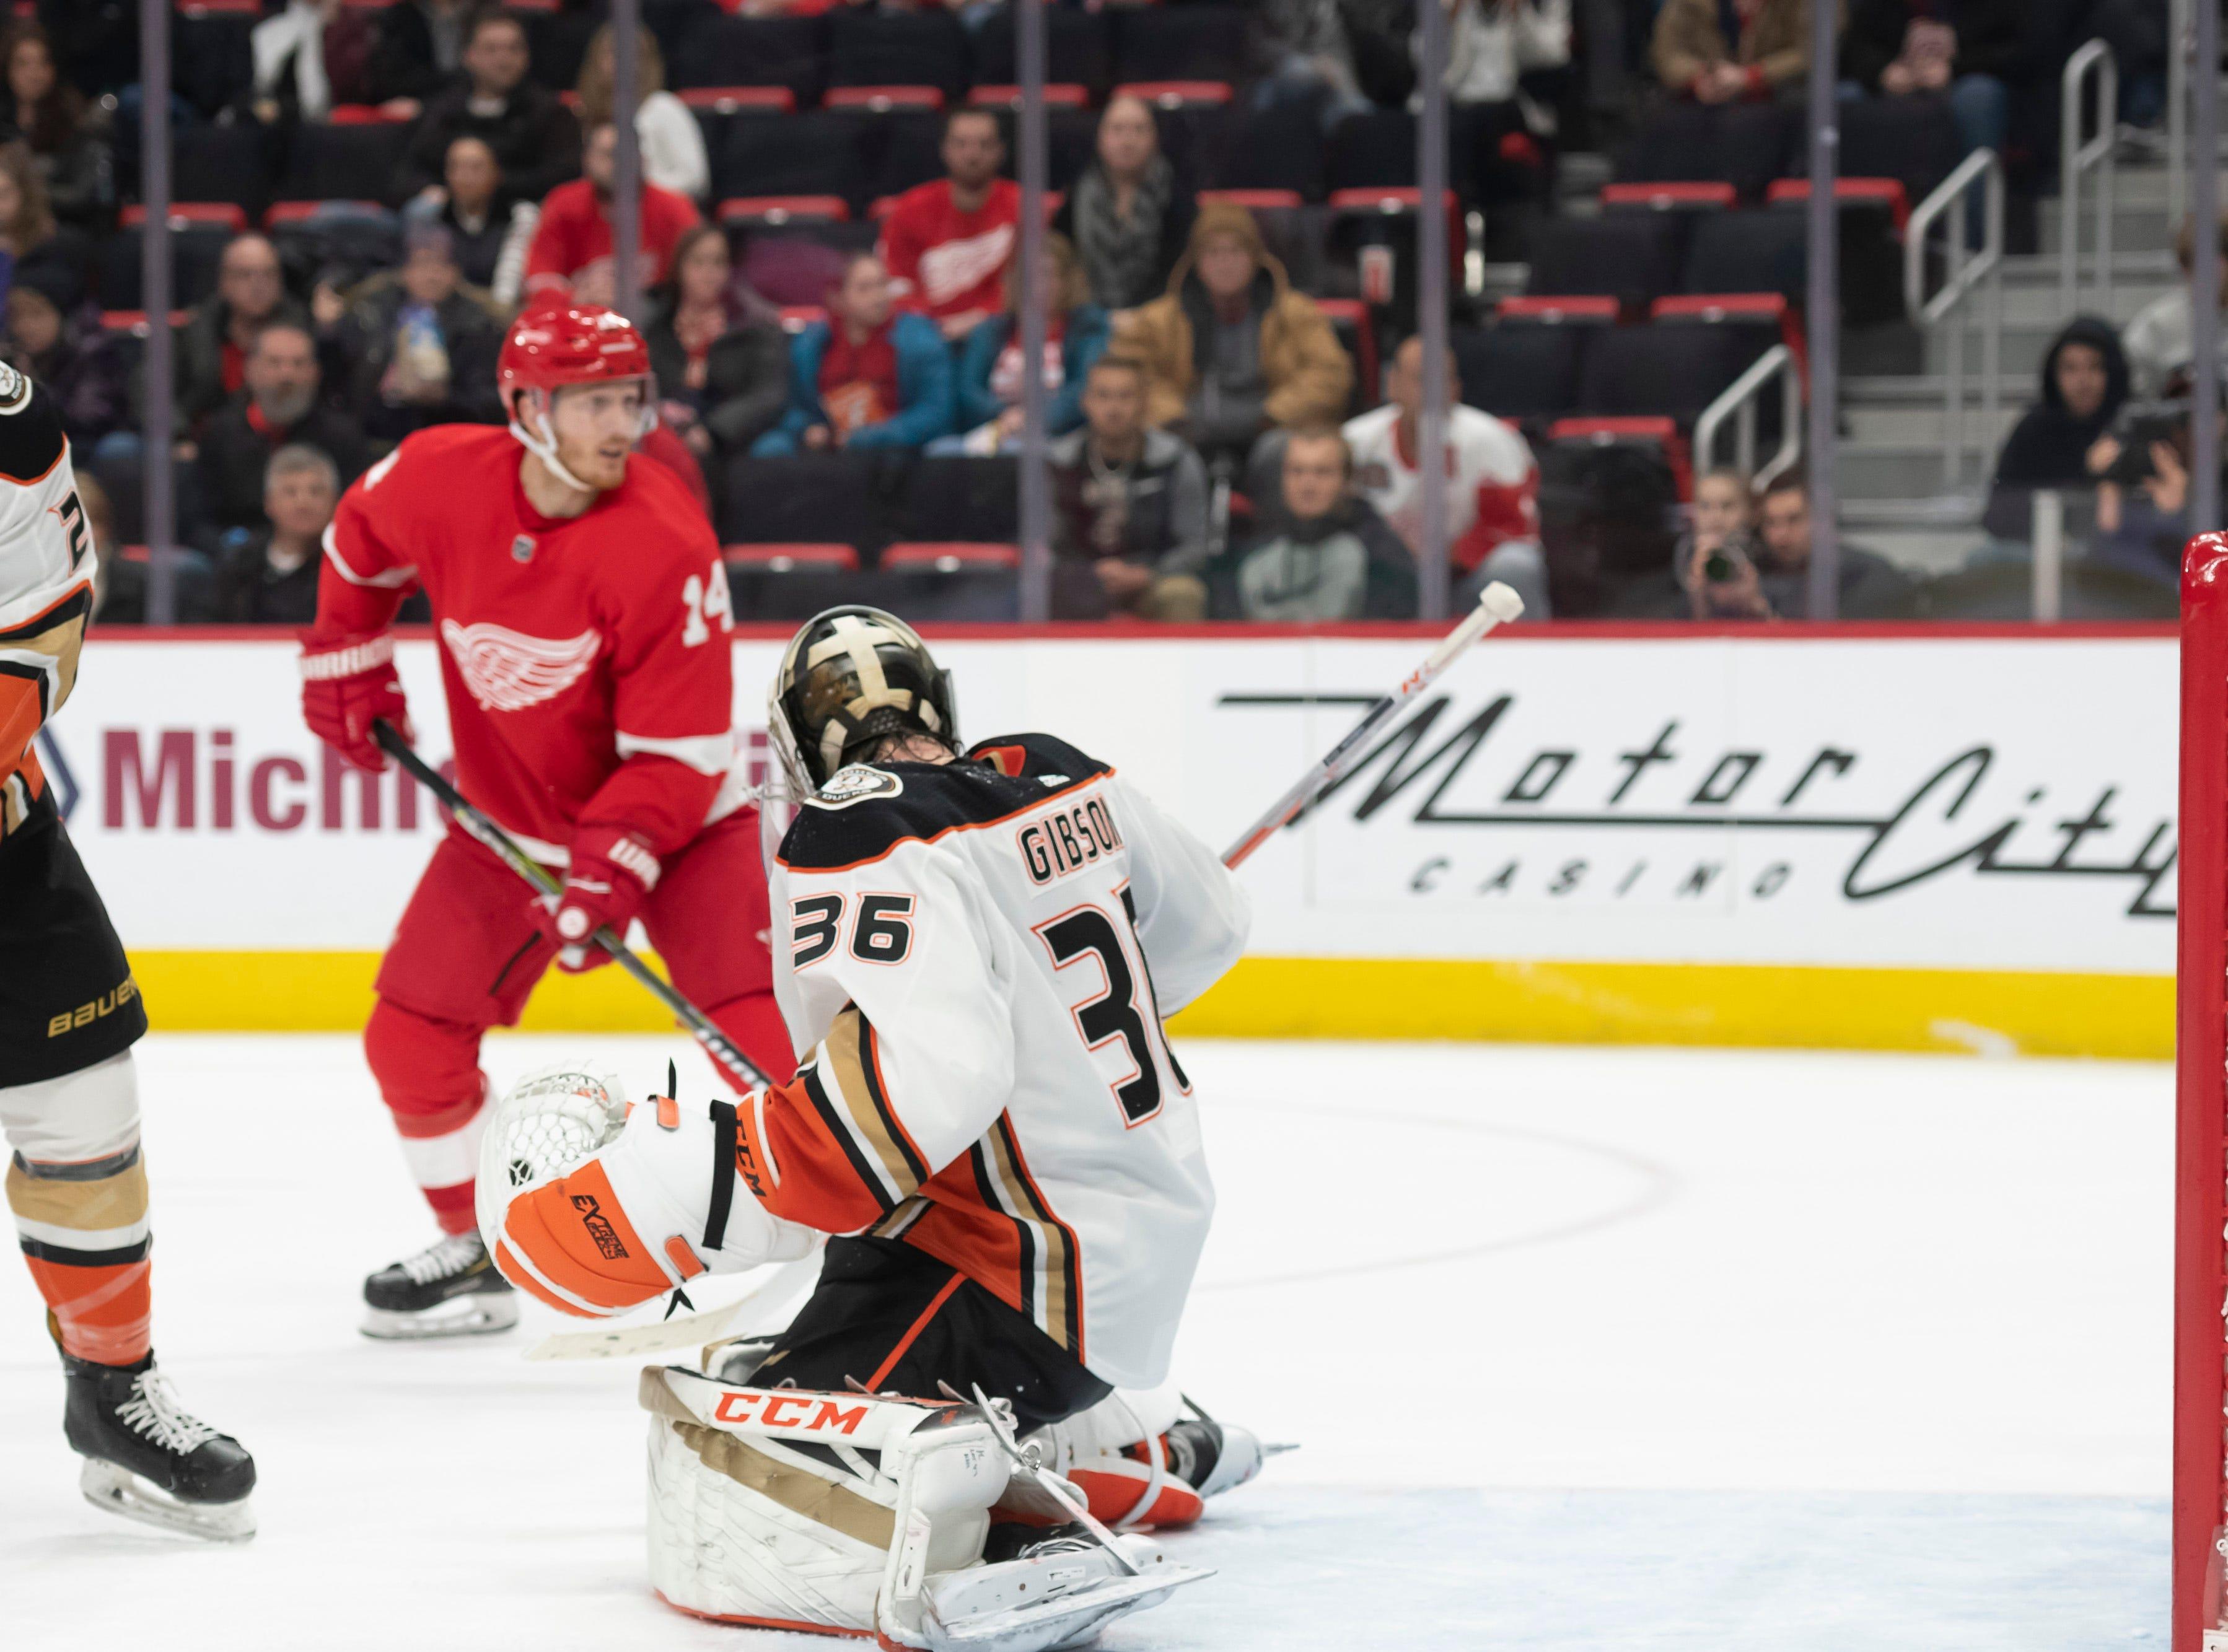 Detroit center Gustav Nyquist sends the puck past Anaheim goaltender John Gibson for a goal in the third period.